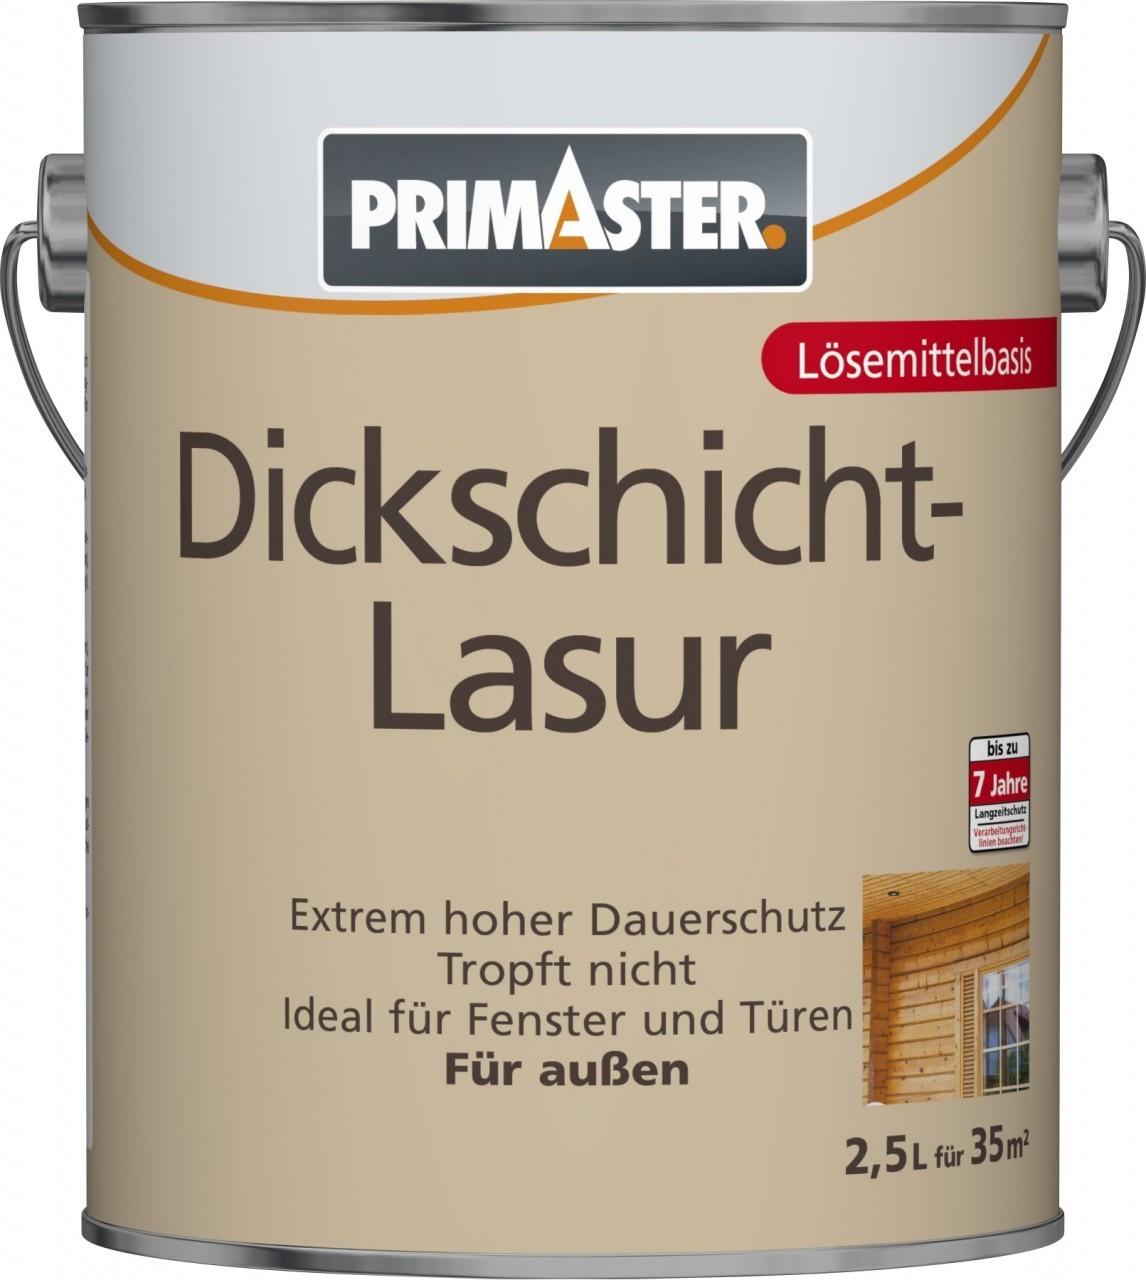 PRIMASTER Dickschichtlasur 2,5 l teak